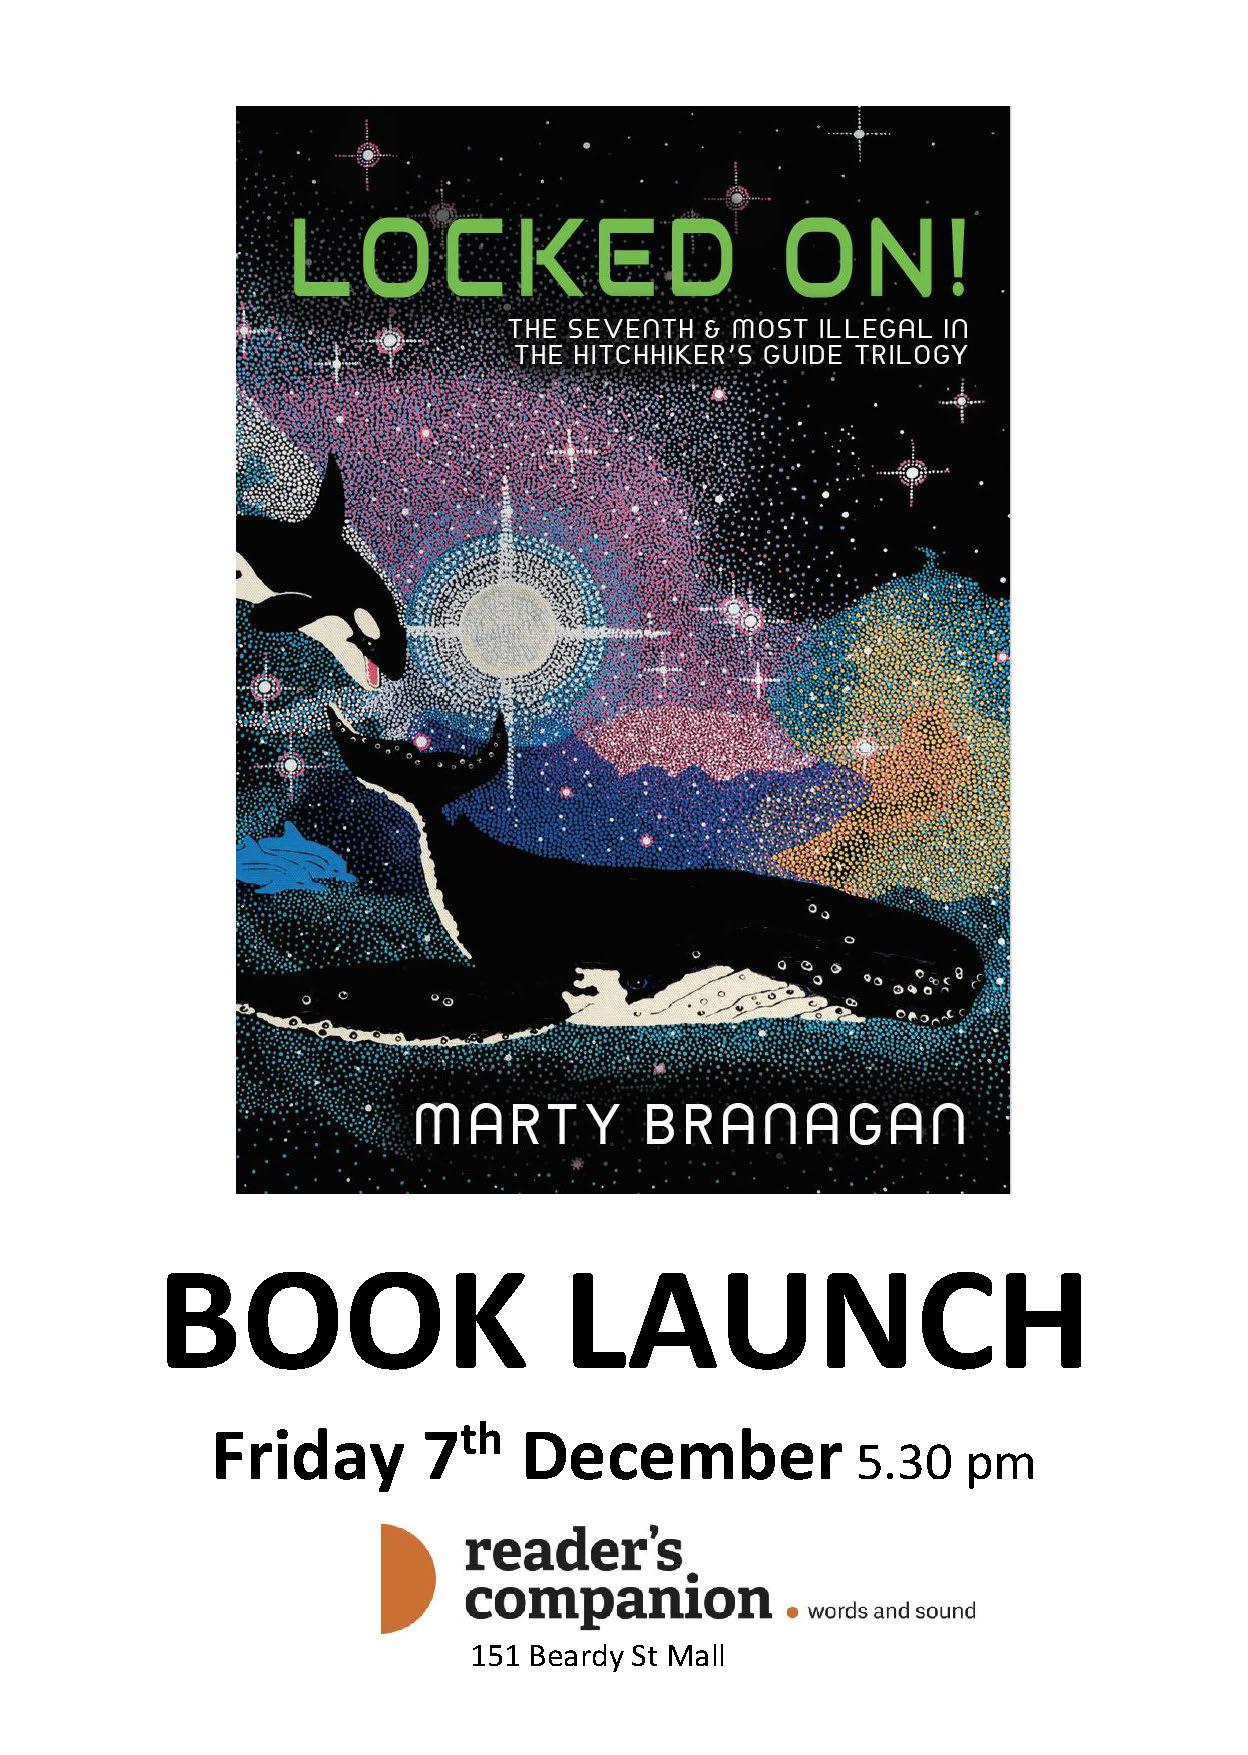 Locked On armidale launch poster.jpg